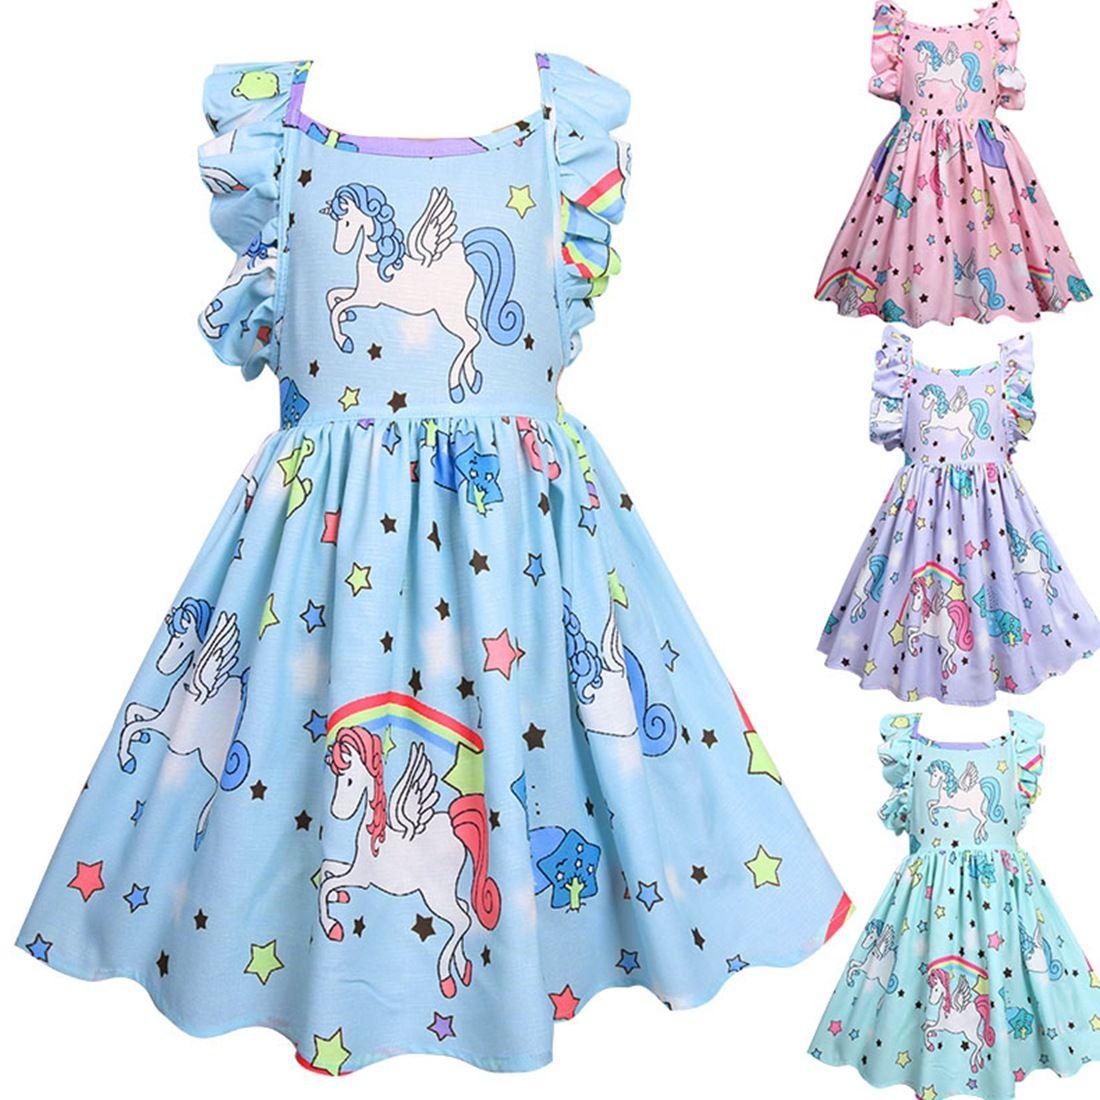 628bed585 Girls Dress Unicorn Print Kids Clothing 2019 Summer Baby Clothes Fashion  Sleeveless Vest Cute Princess Party Dress